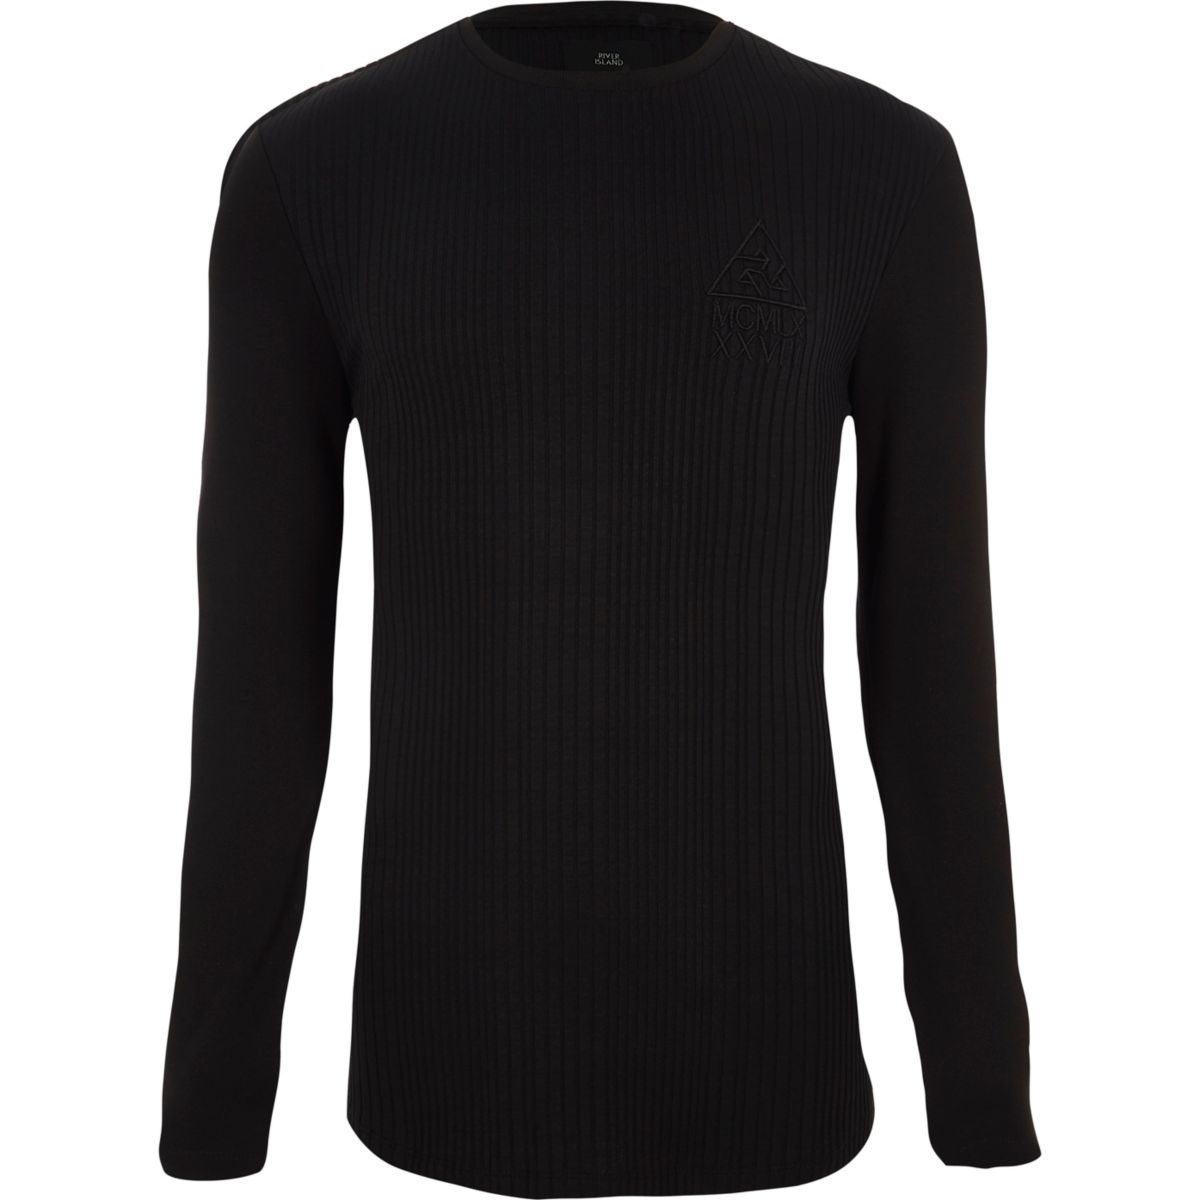 Black rib muscle fit long sleeve T-shirt